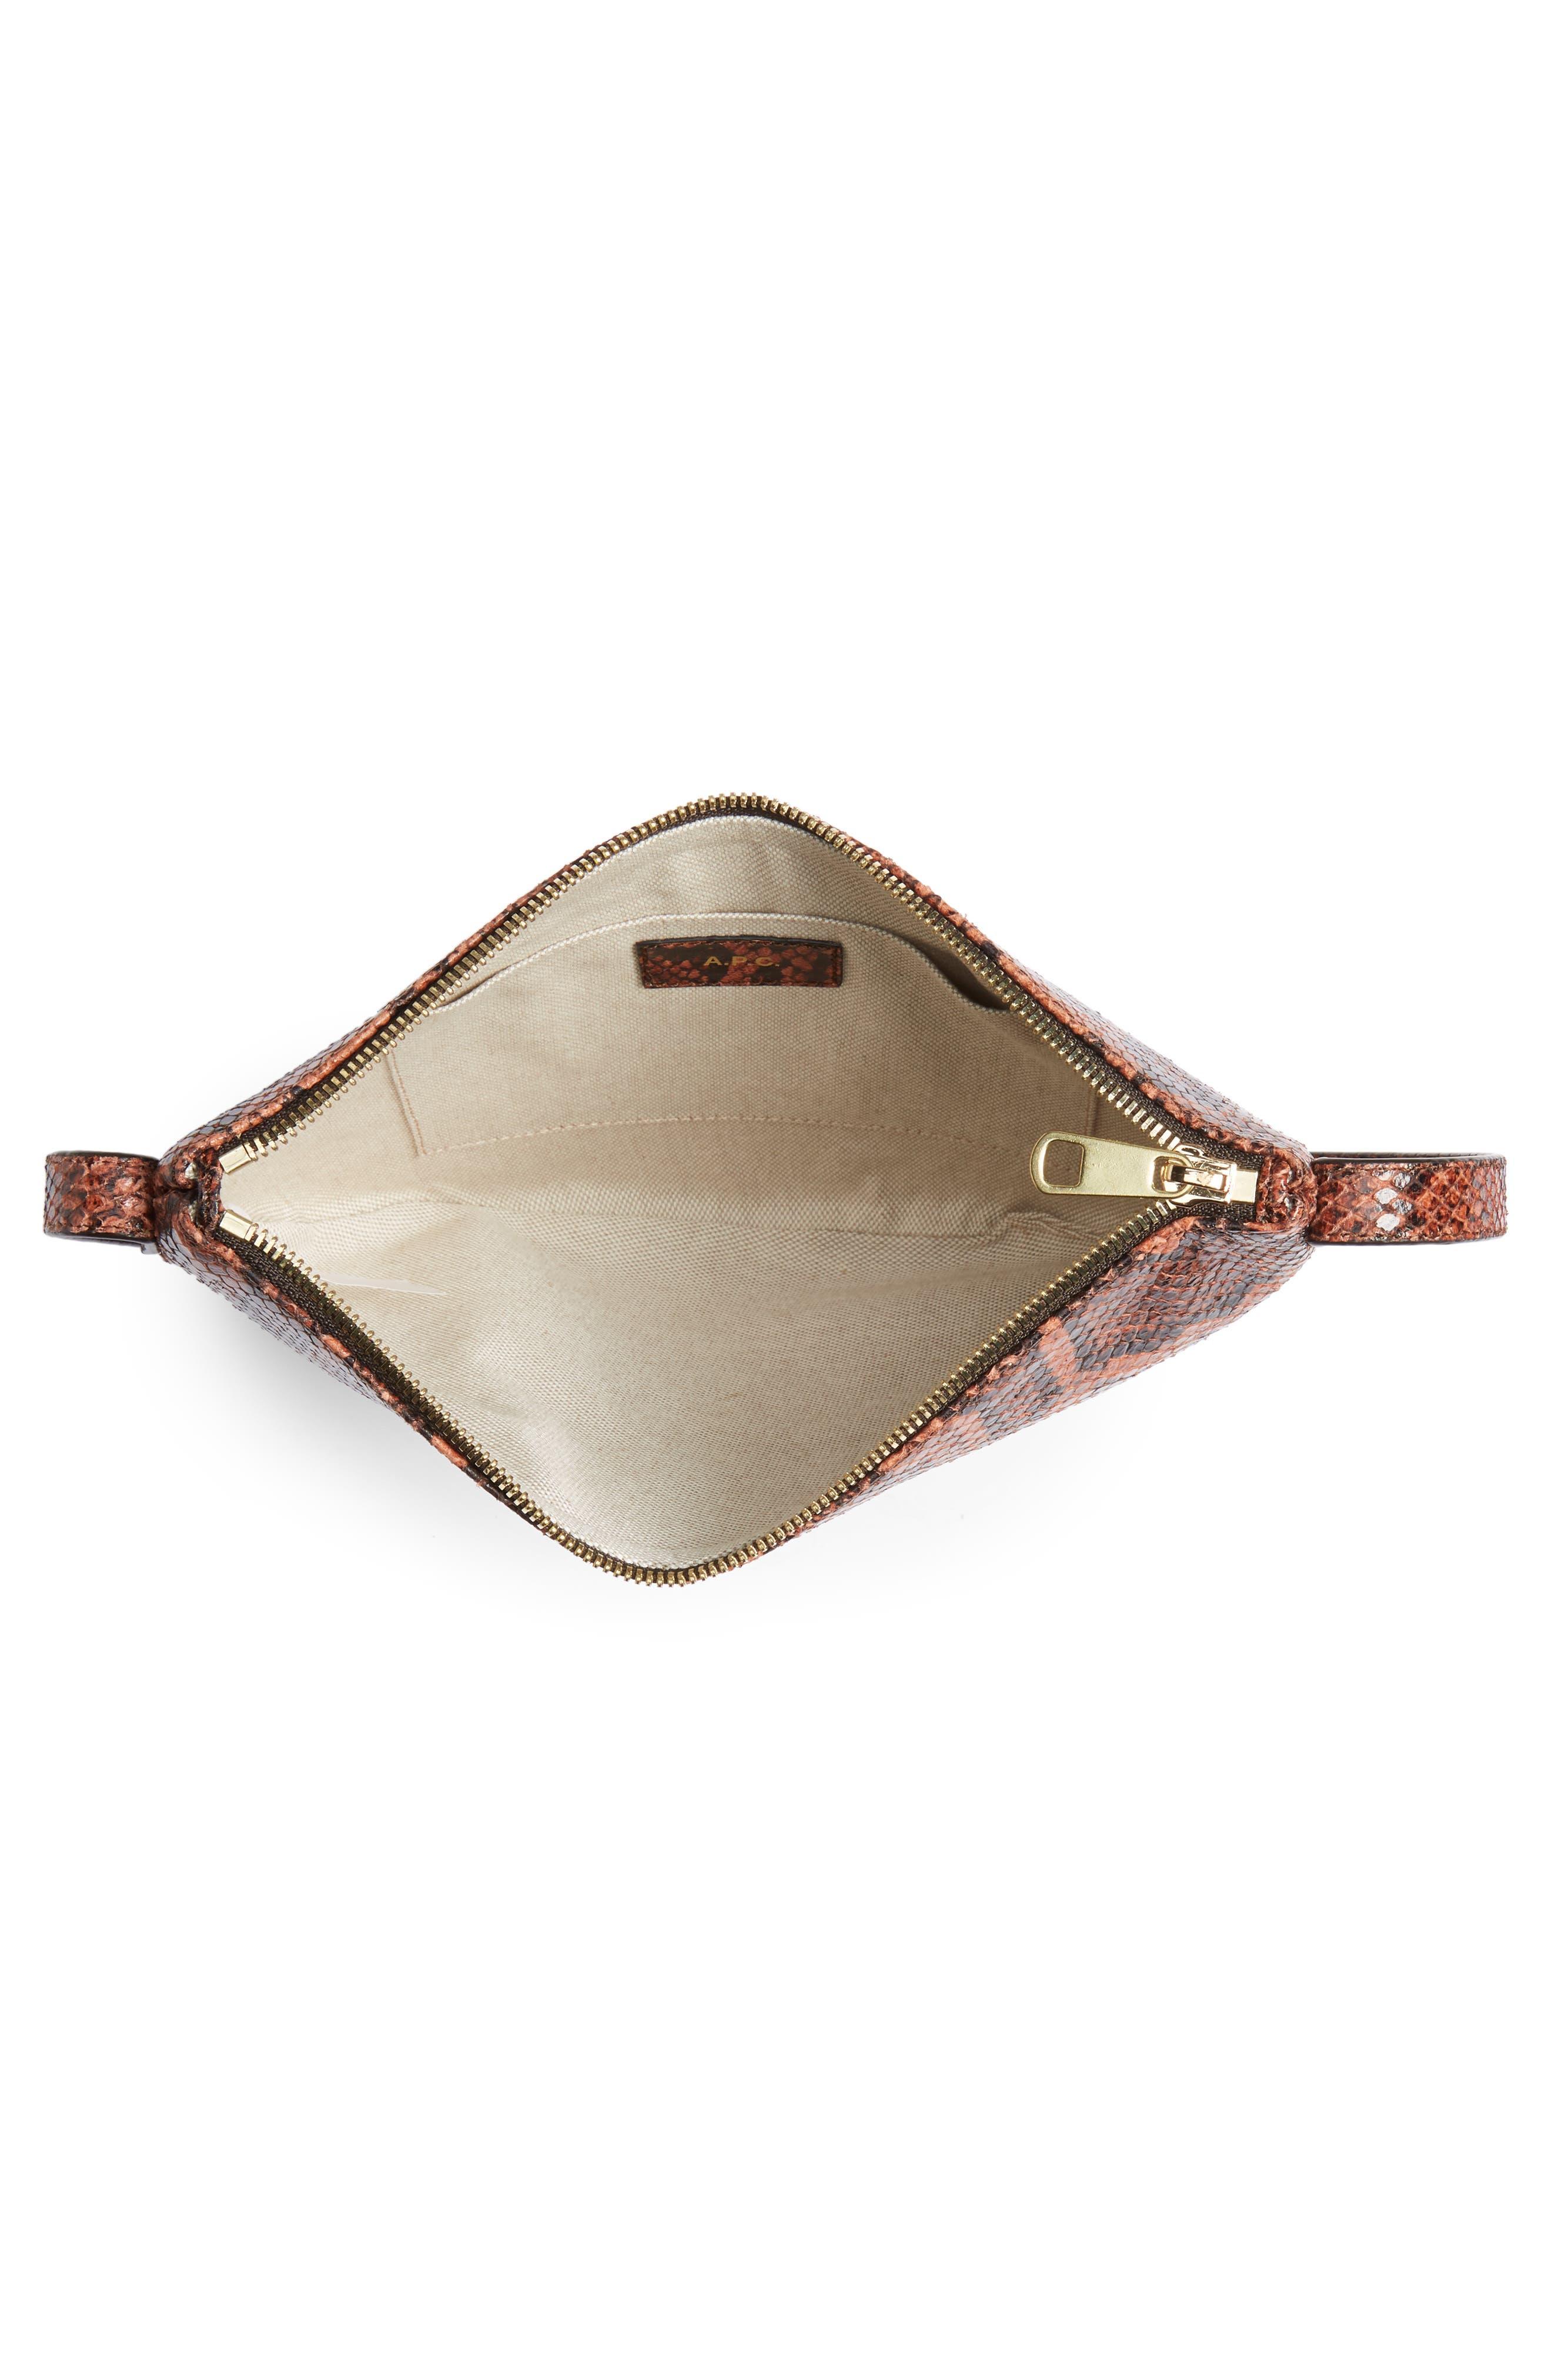 A.P.C., Sac Maelys Python Embossed Leather Crossbody Bag, Alternate thumbnail 5, color, EAF BRIQUE